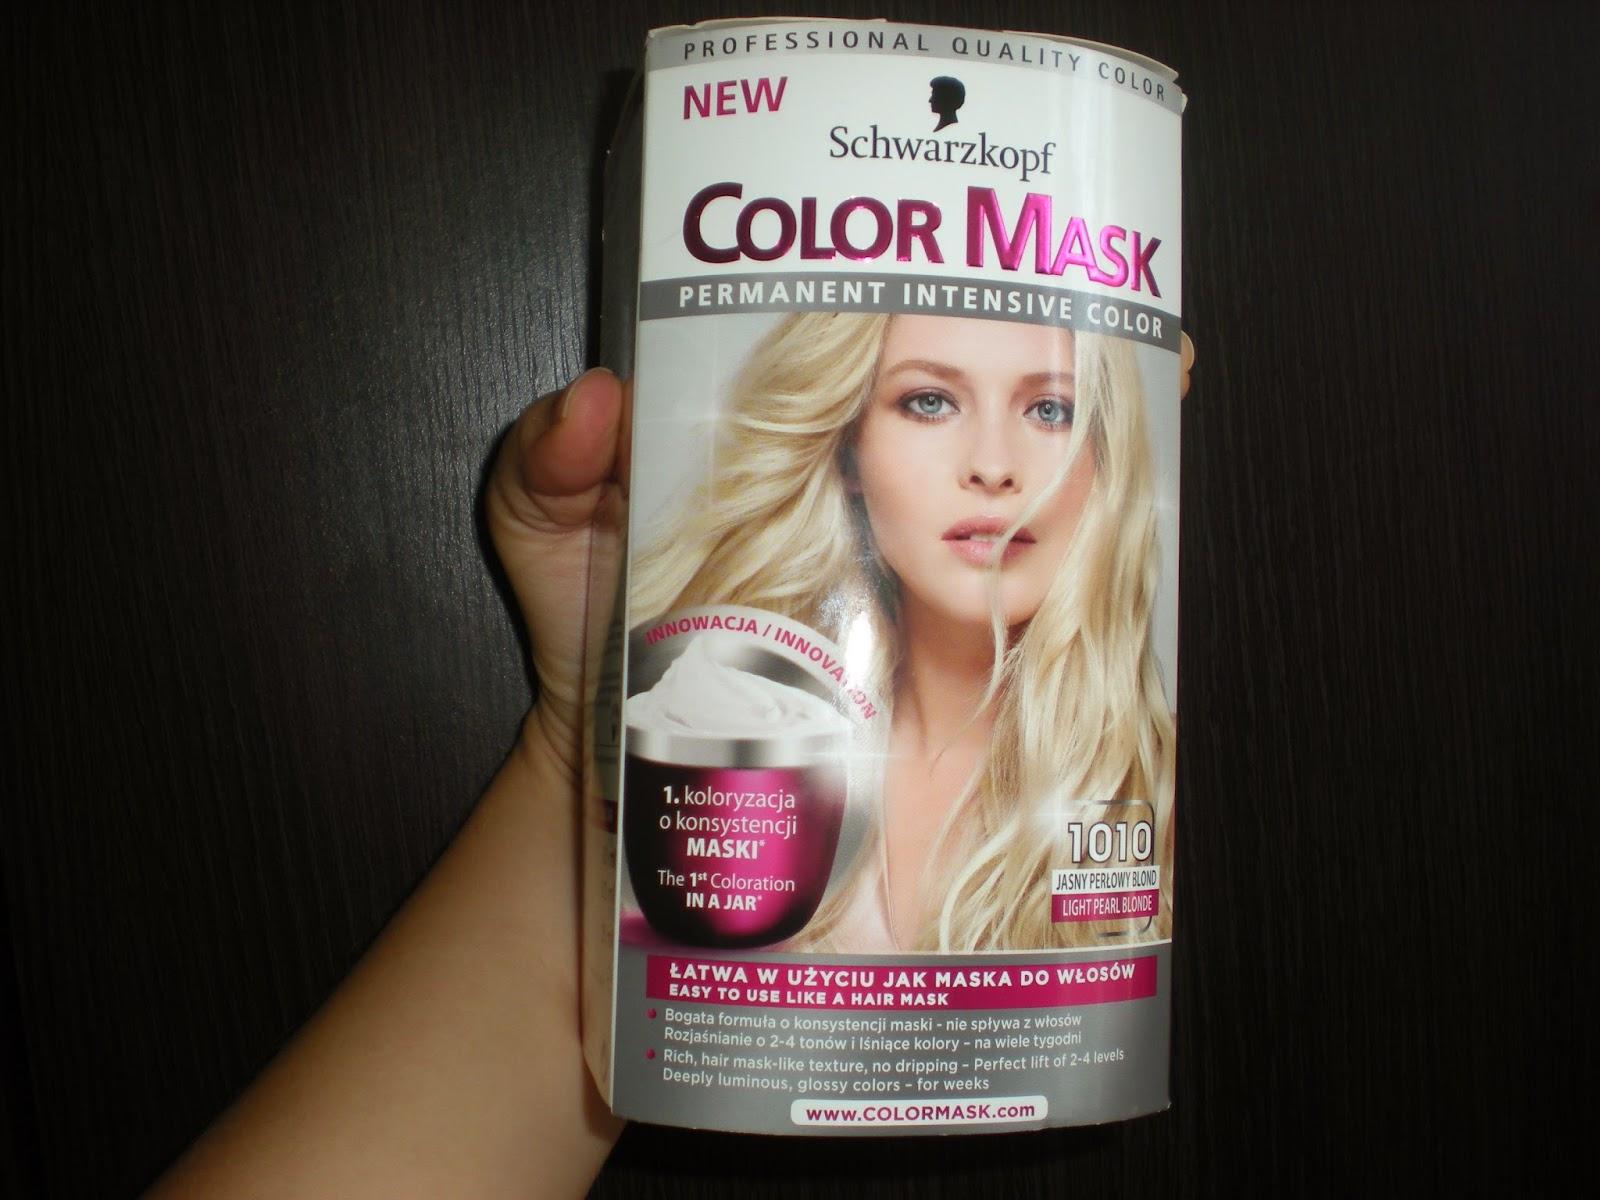 Recenzja: Color Mask 1010 od Schwarzkopf!